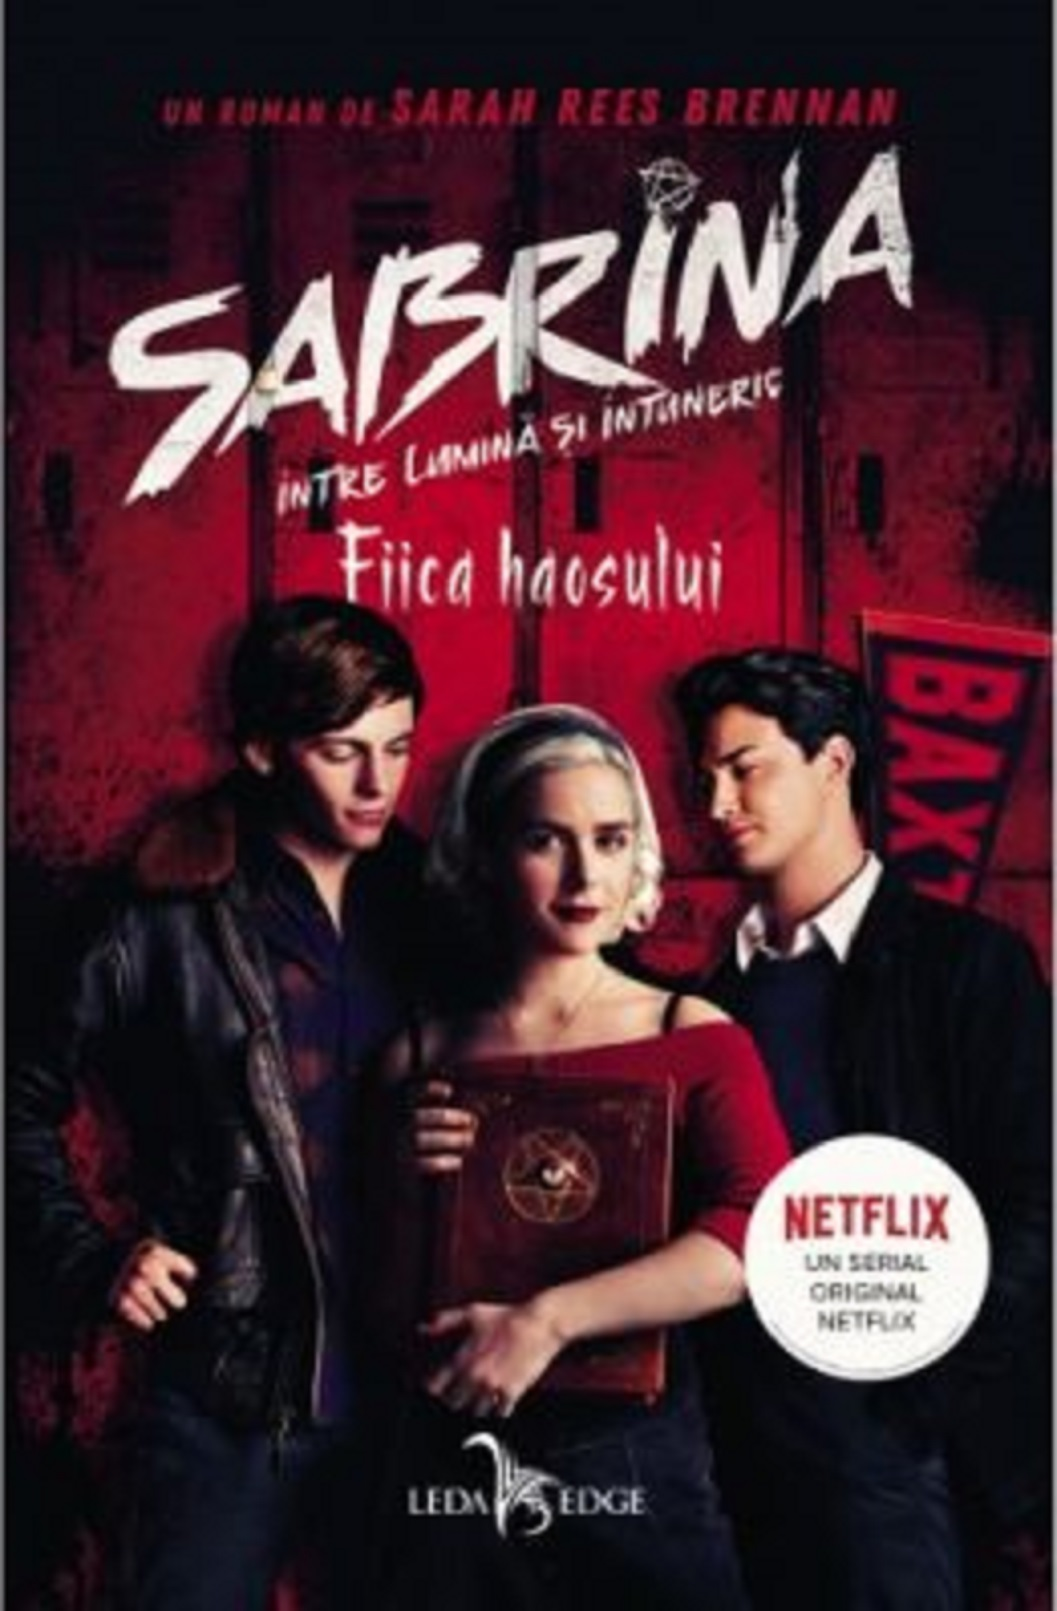 Sabrina - Fiica haosului | Sarah Rees Brennan